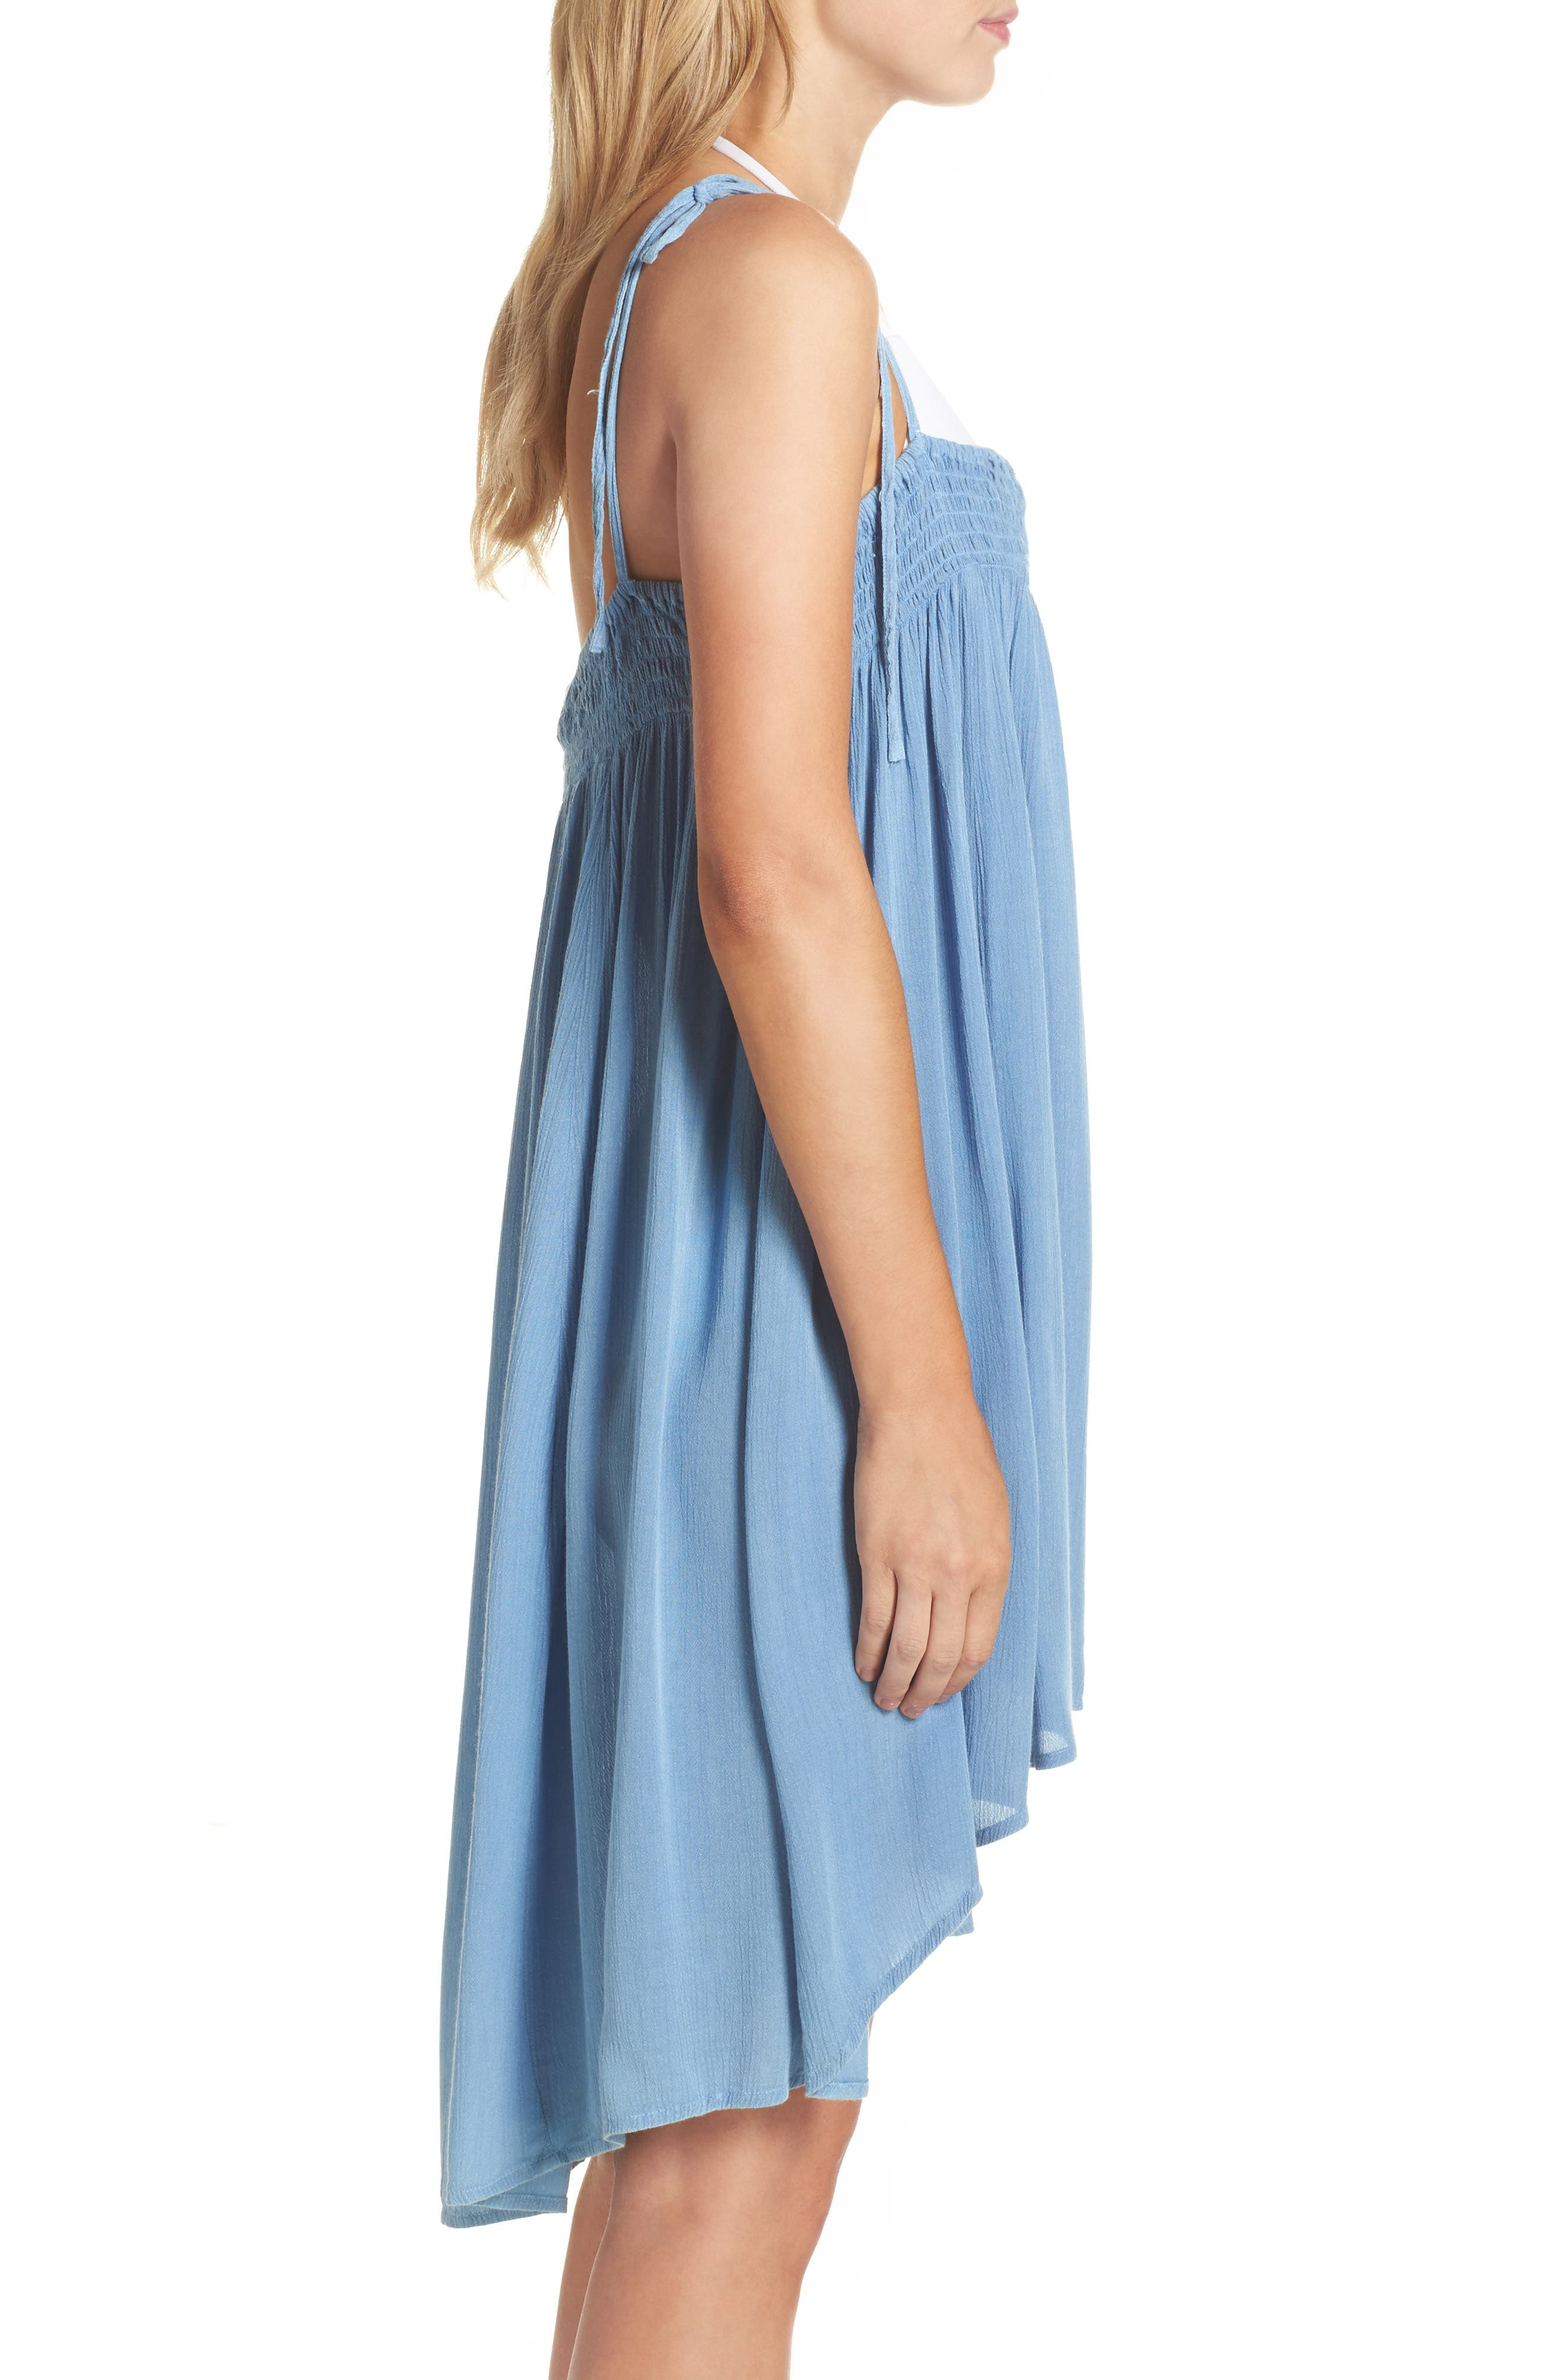 Oliva Cover-Up Dress,                             Alternate thumbnail 3, color,                             462